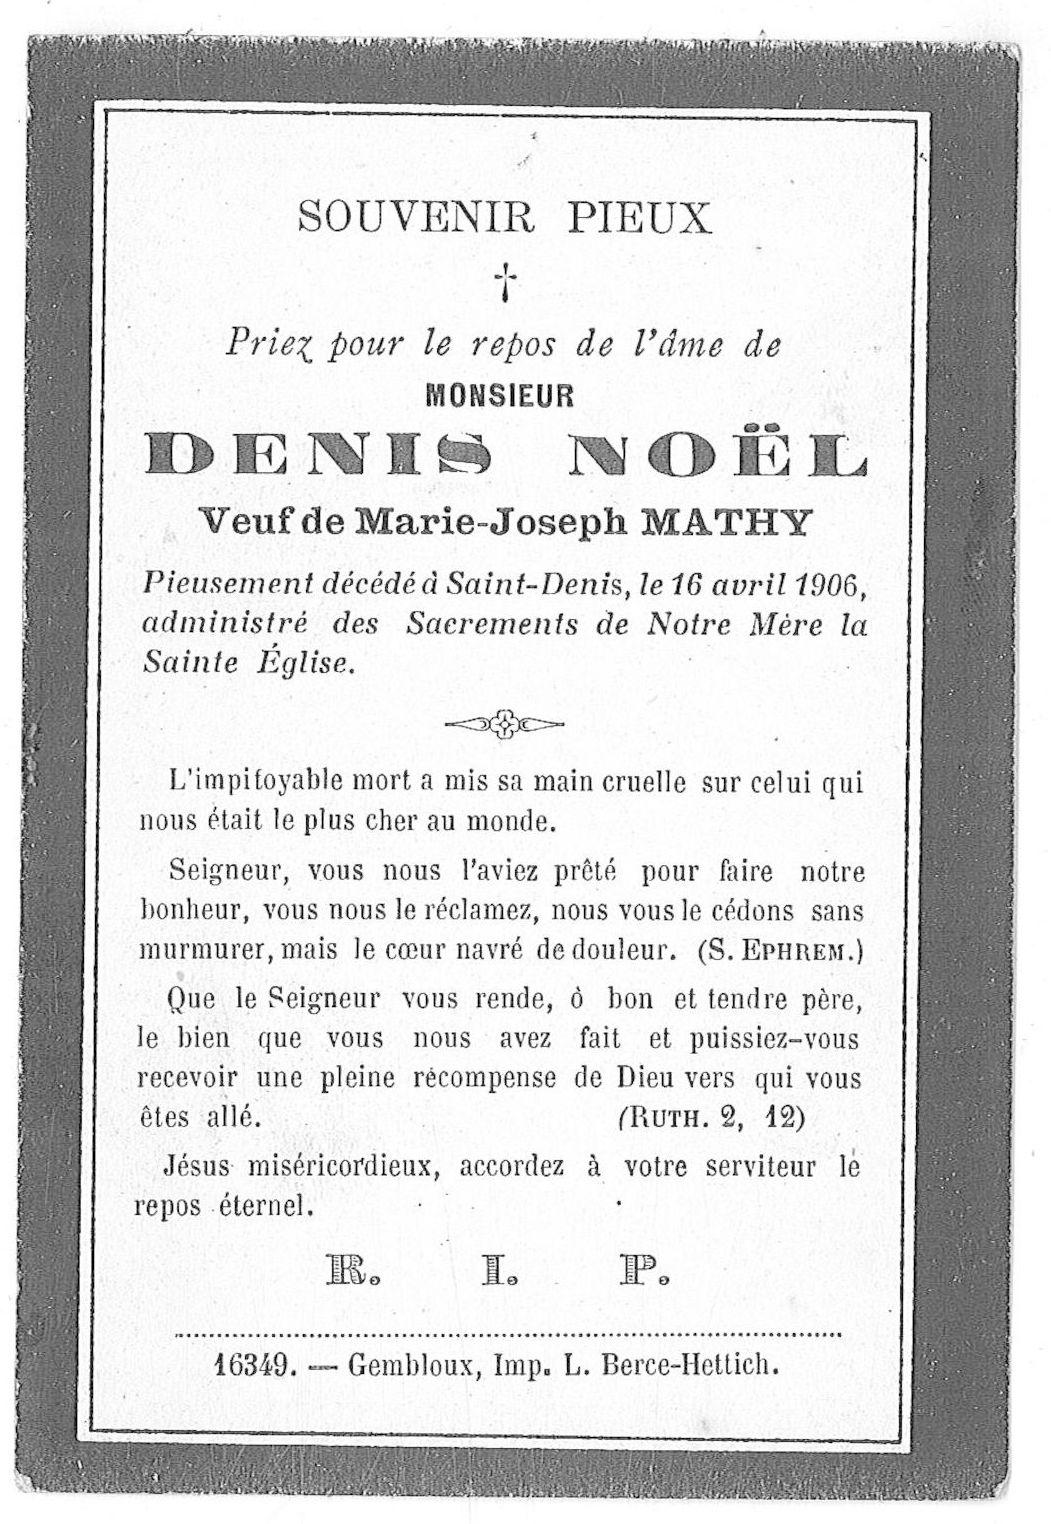 Denis Noël